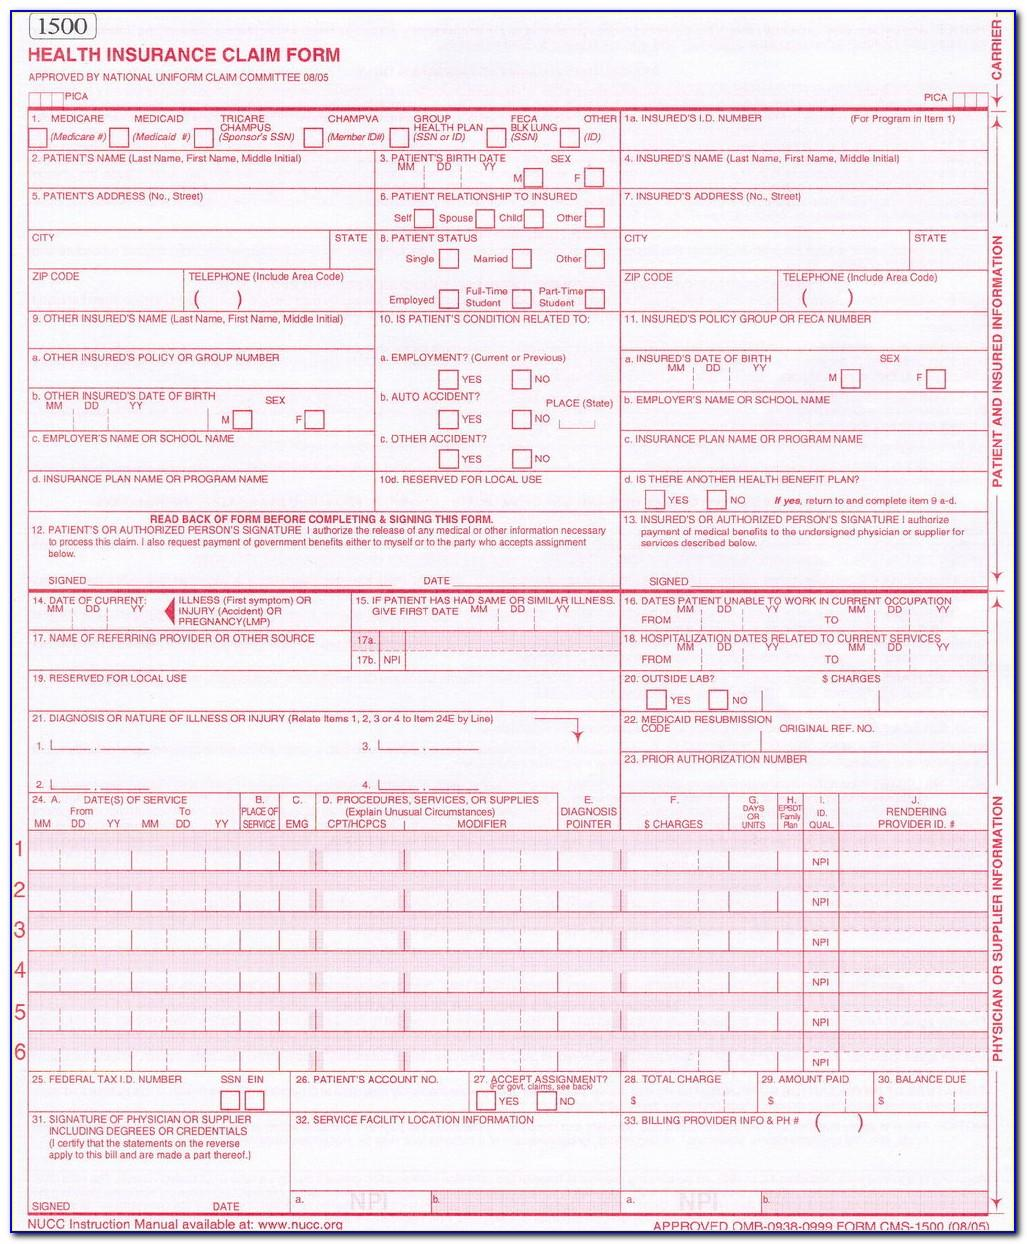 1500 Health Insurance Claim Form Cpt Hcpcs